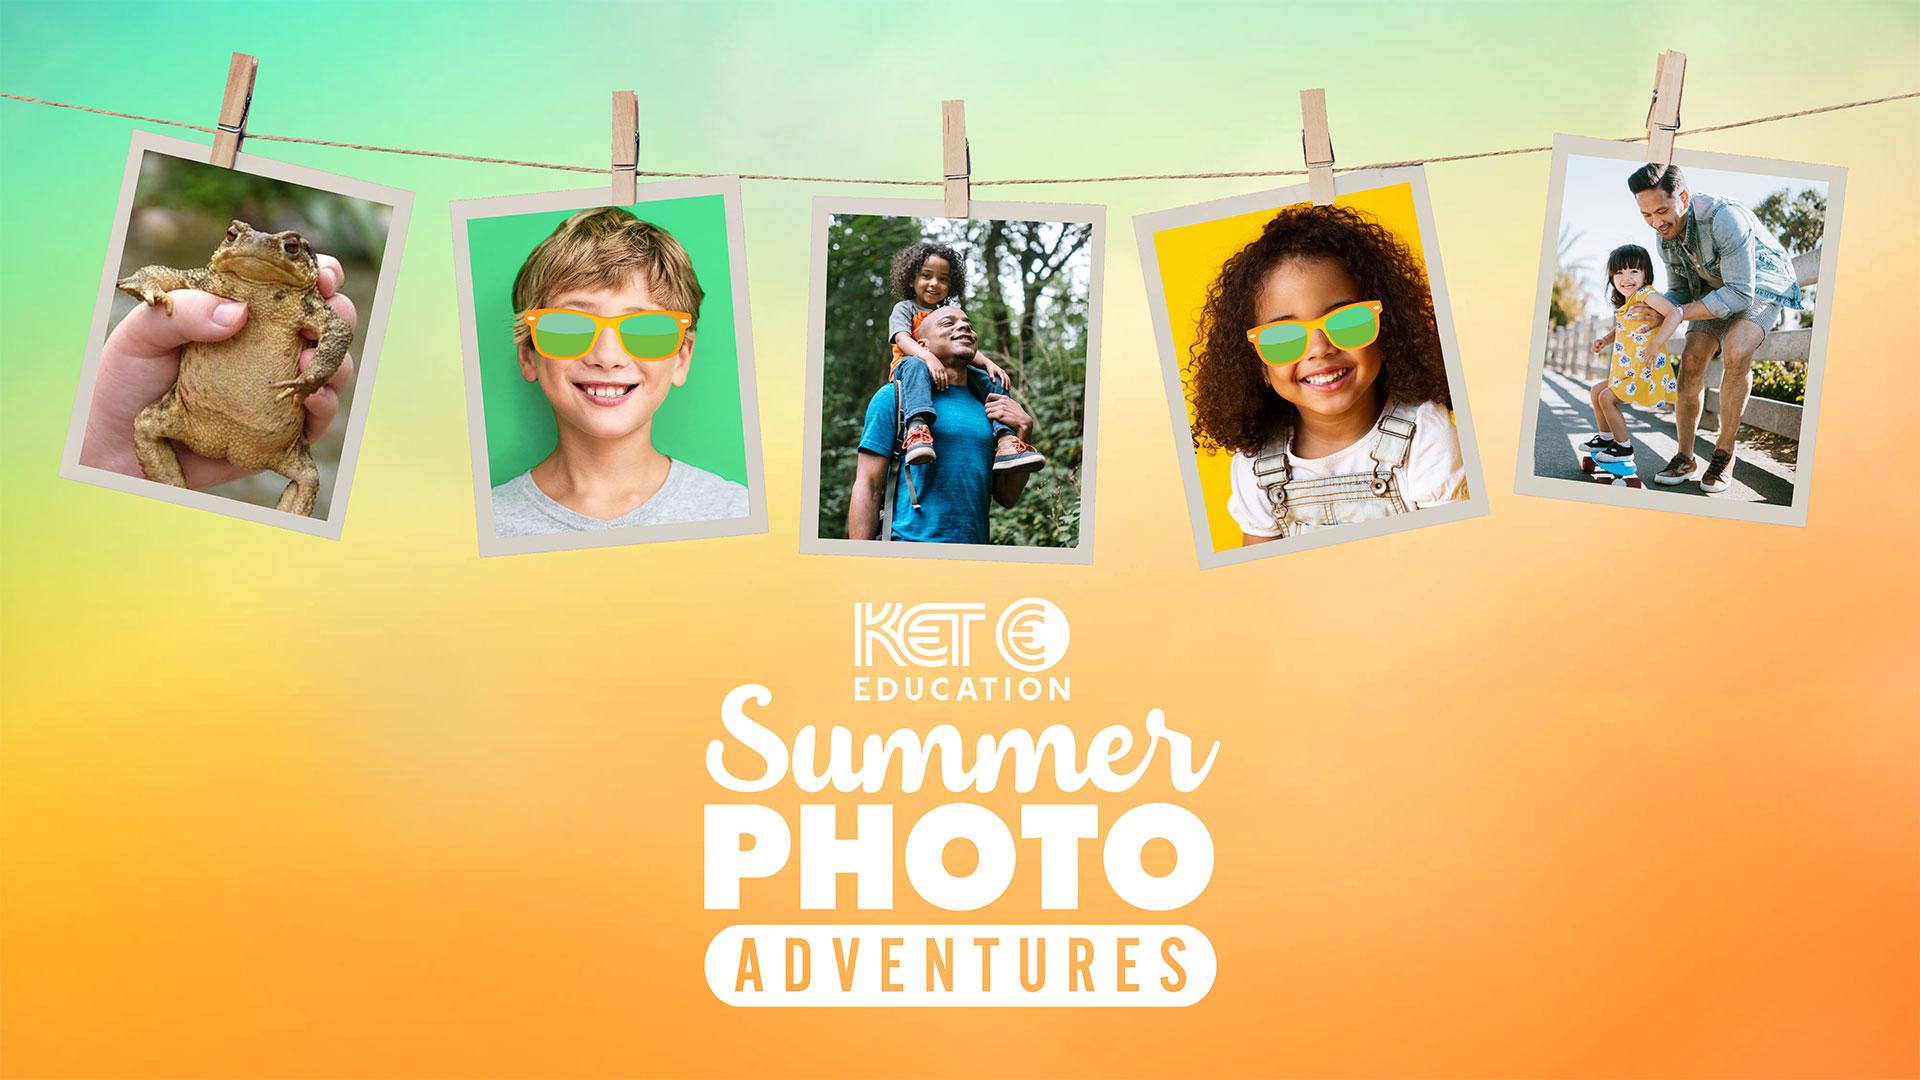 Summer Photo Adventures promo